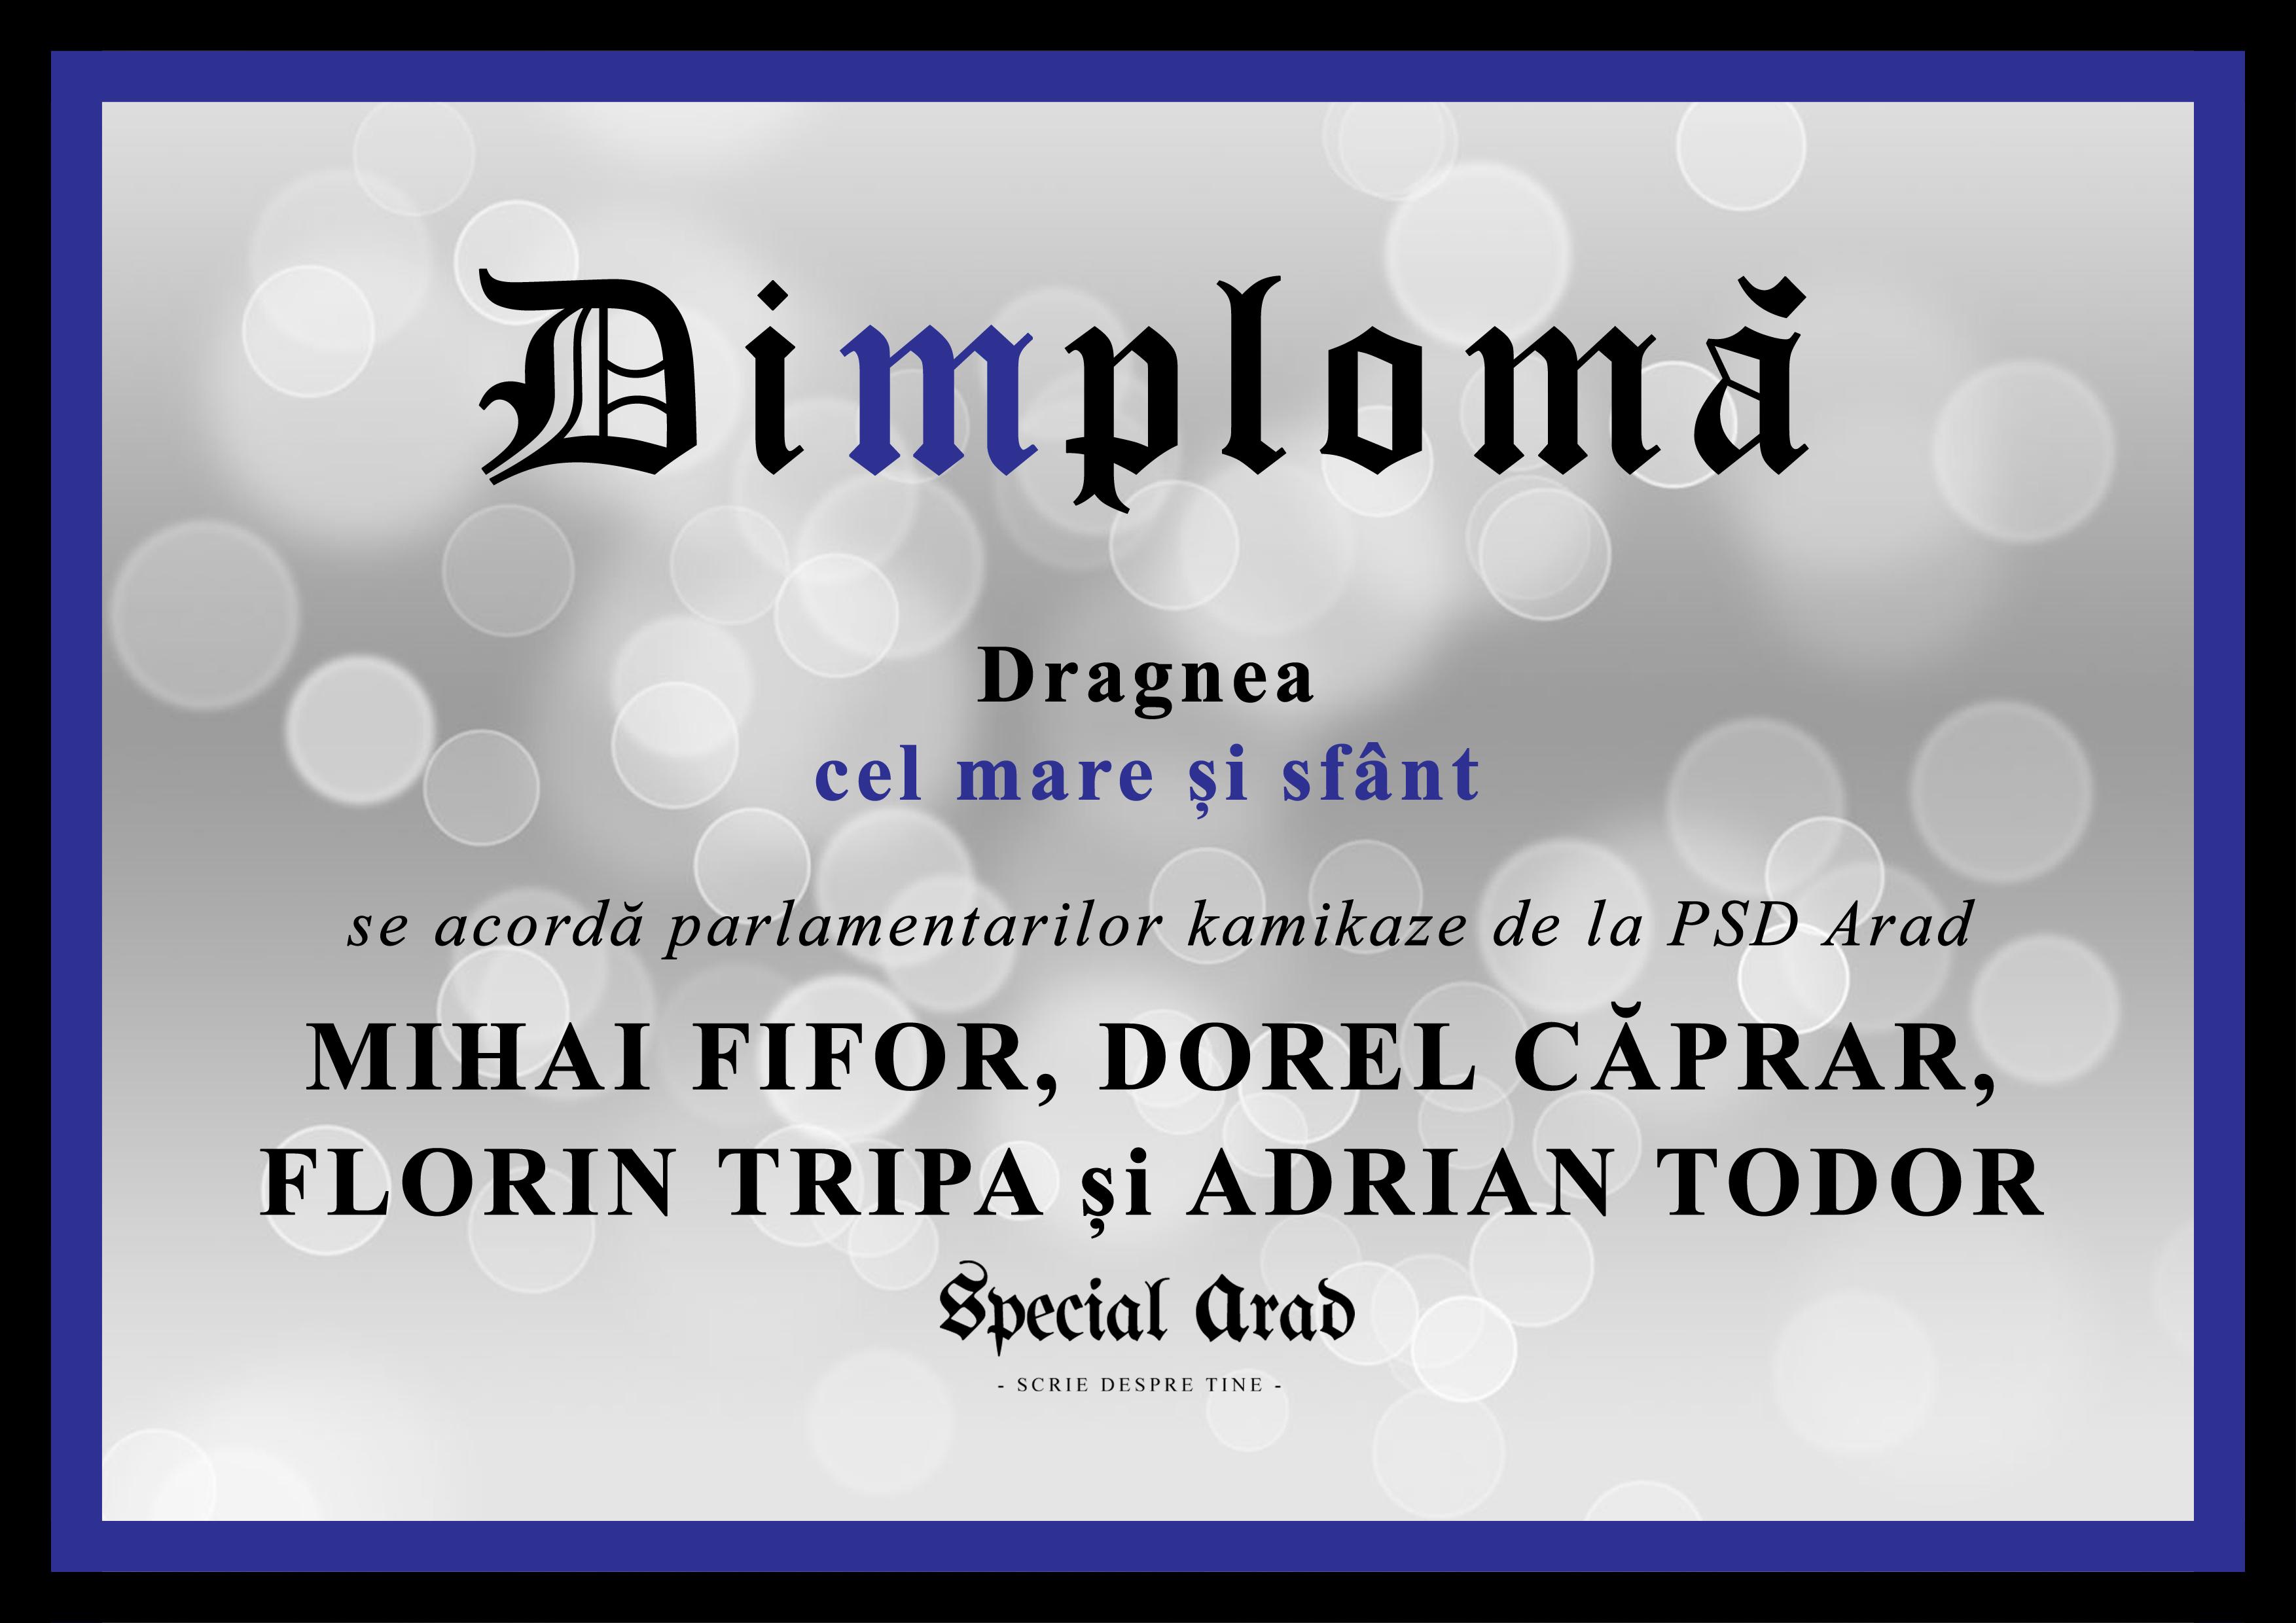 dimploma-dragnea-cel-mare-si-sfant